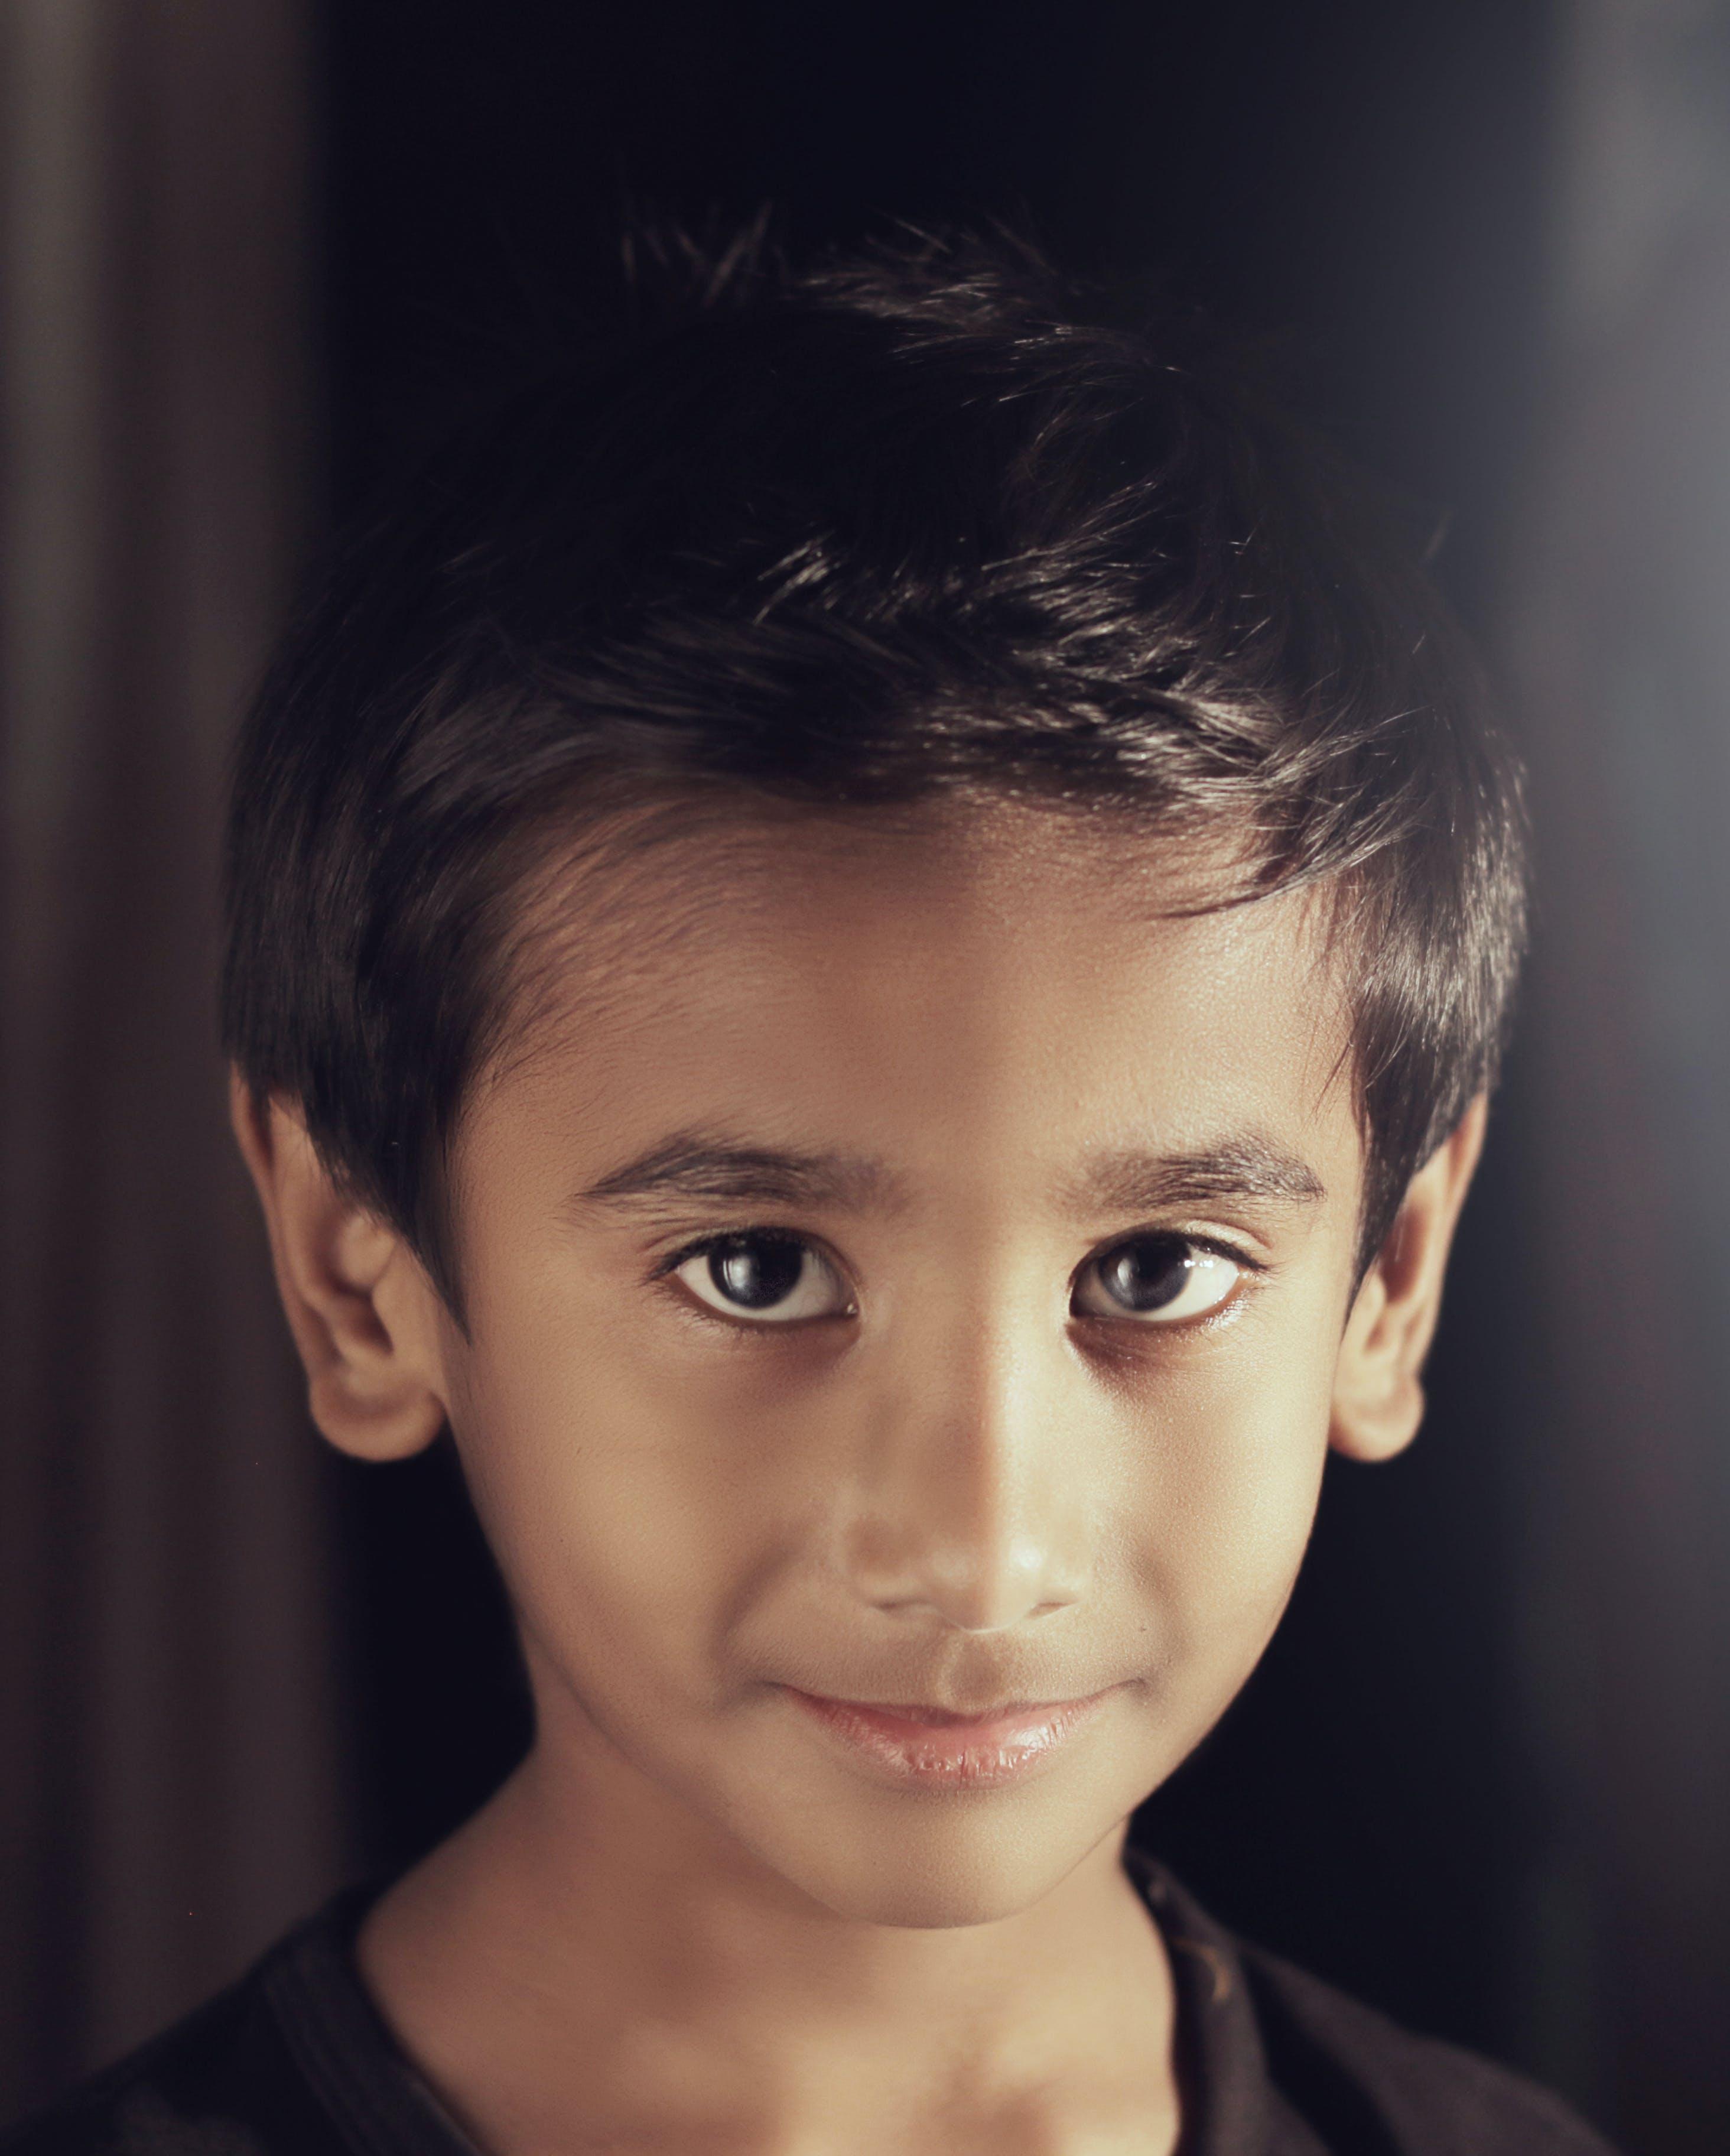 Free stock photo of cute kids, cute kids clothes, cute kids images, cute kids pics